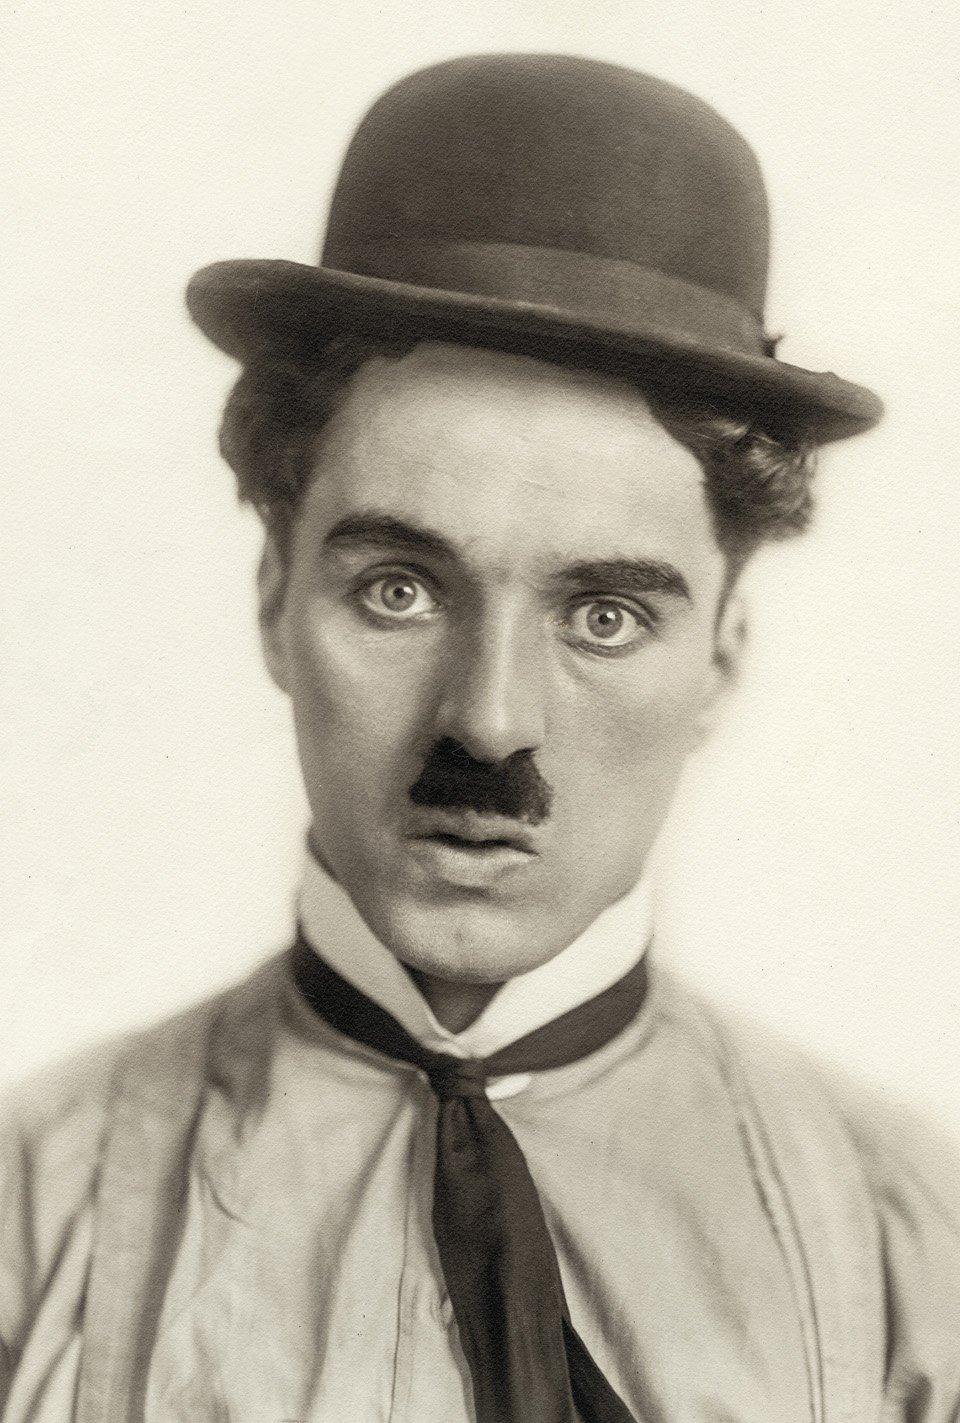 Chaplin Fan? You Shoul...